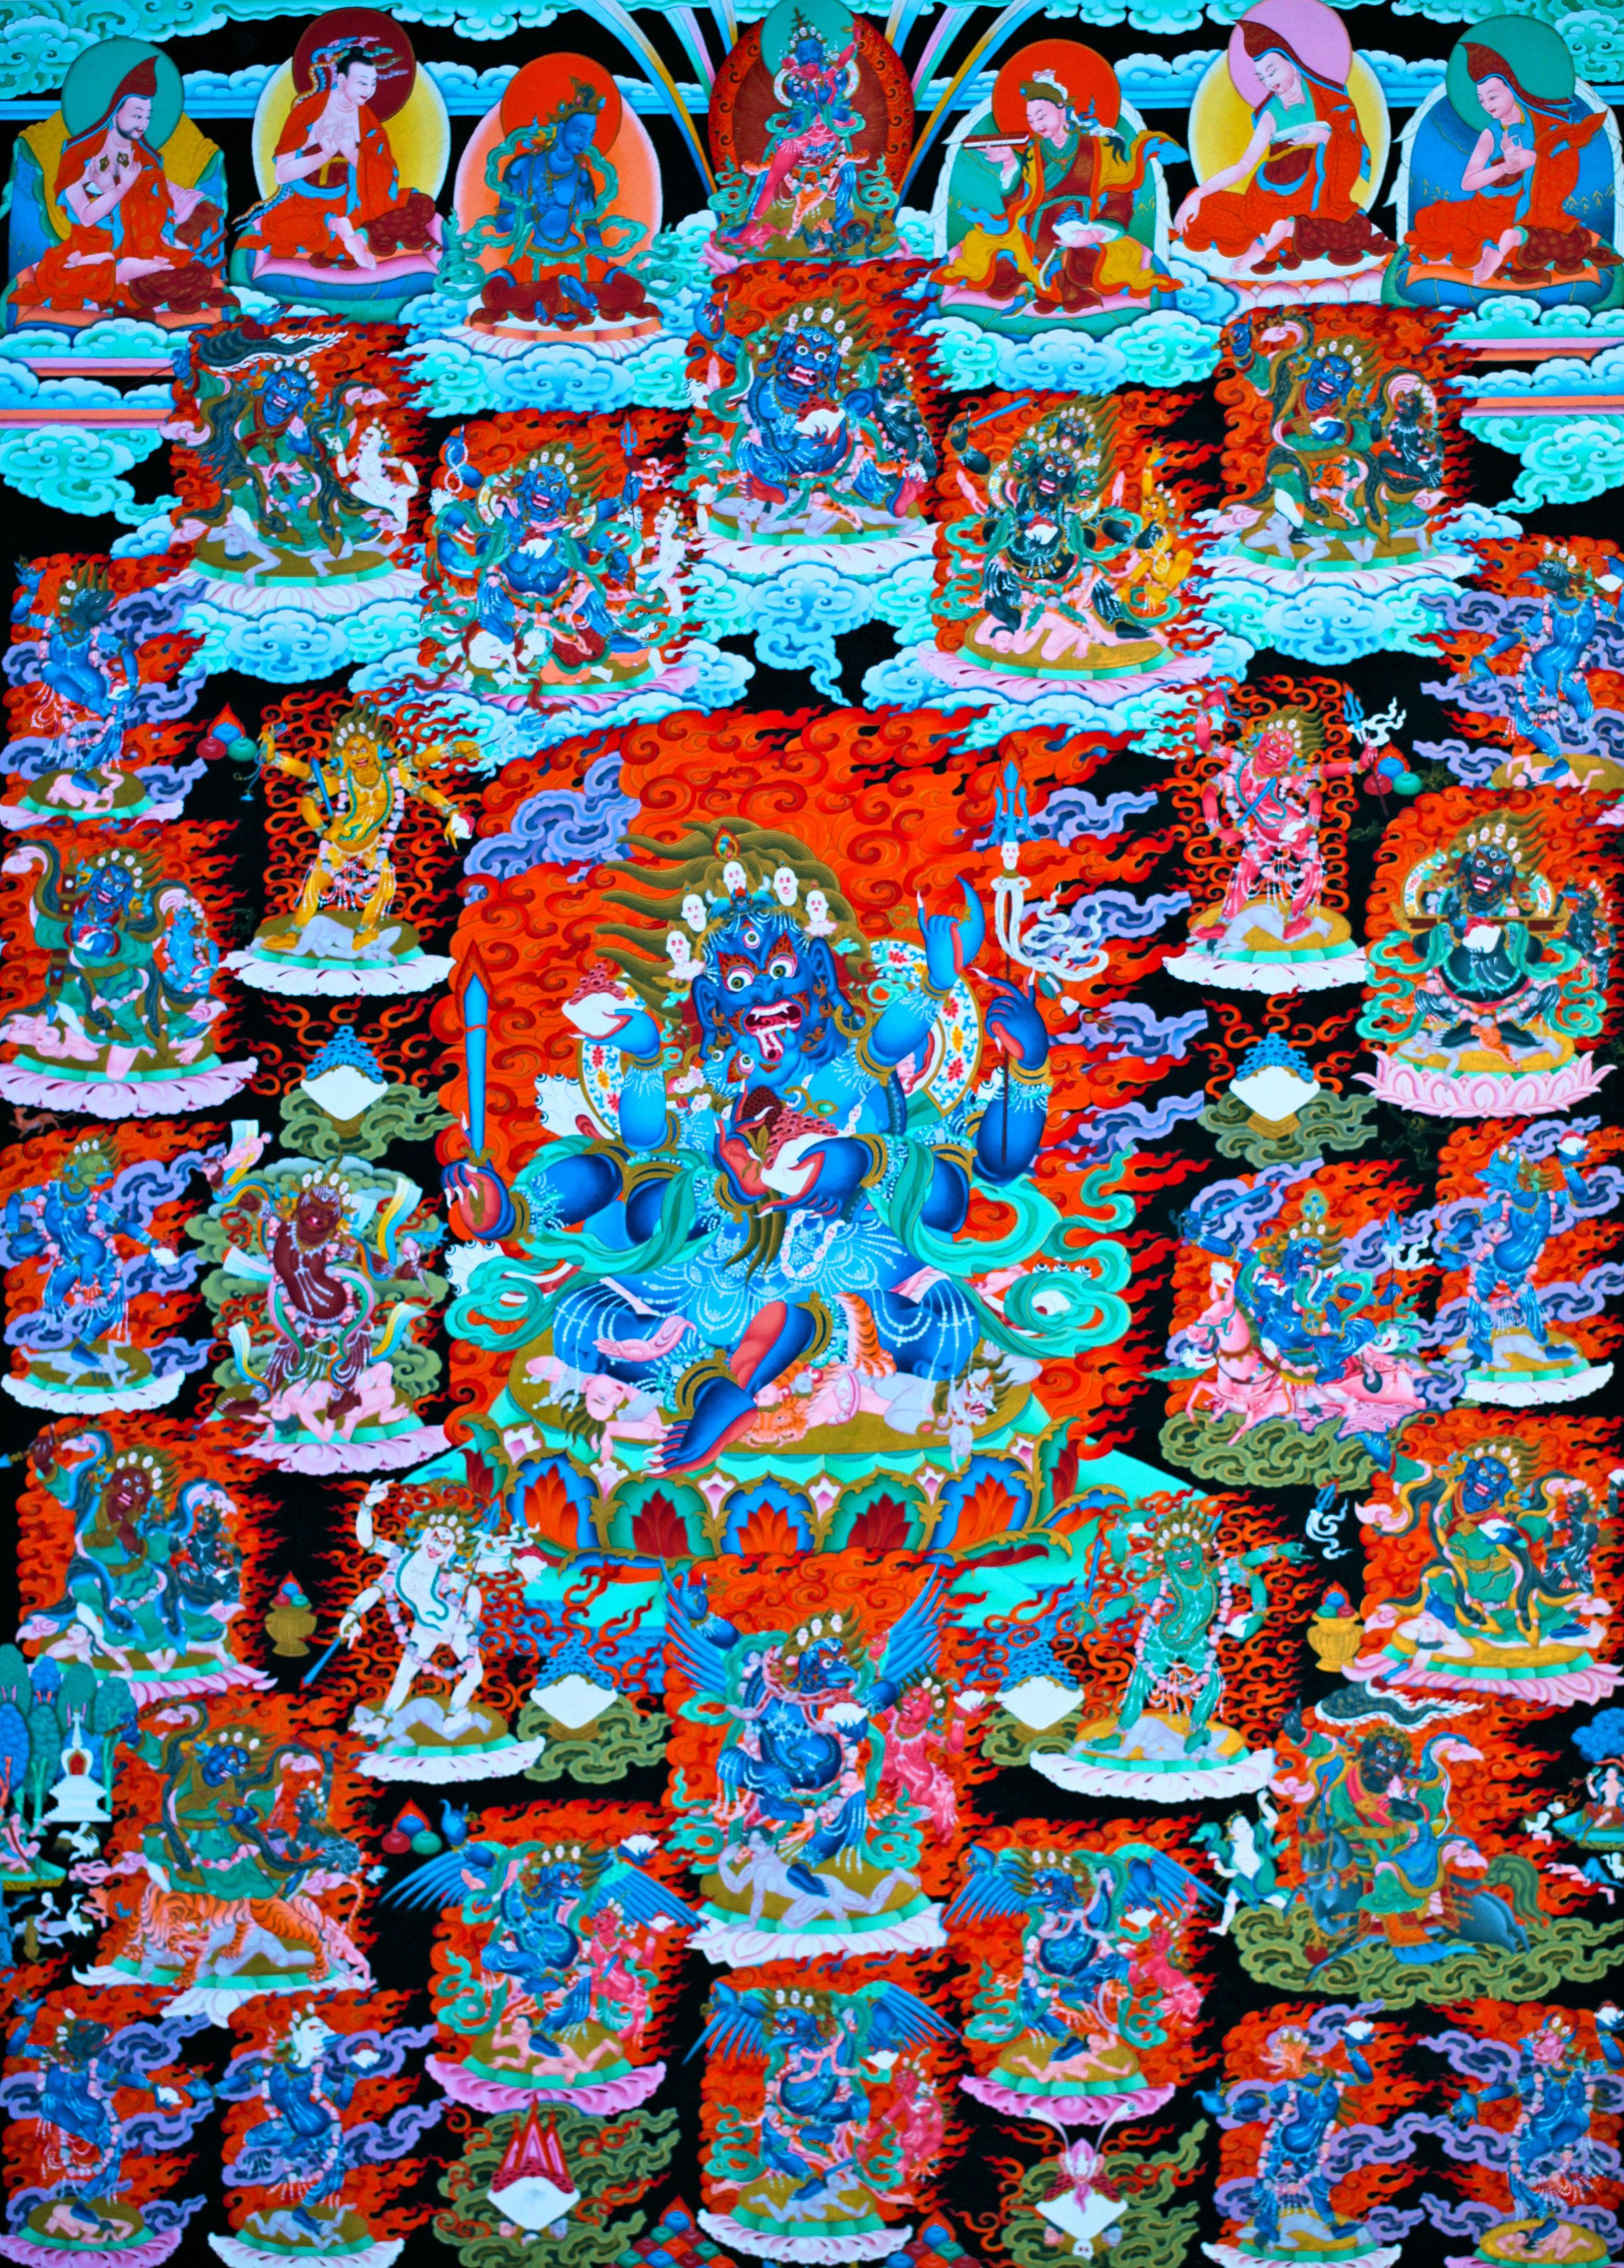 Dechen Choekhor Four-armed Mahakala thangka